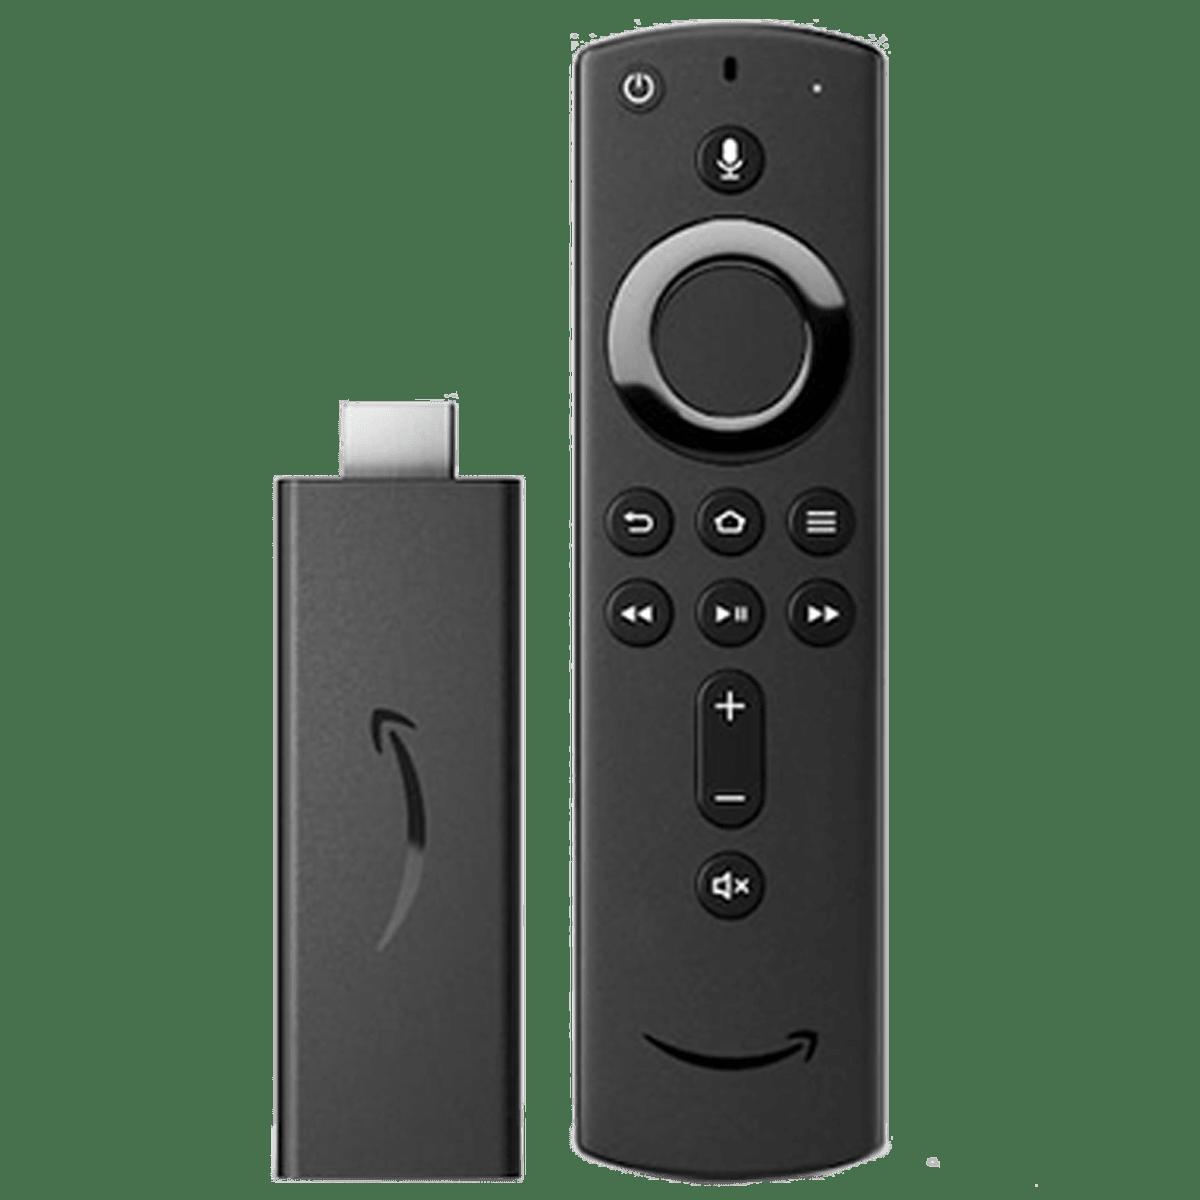 Amazon FireTV Stick 3rd Gen With Alexa Voice Remote (Stream HD Quality Video with Dolby Atmos Audio, B07ZZX5ZSW, Black)